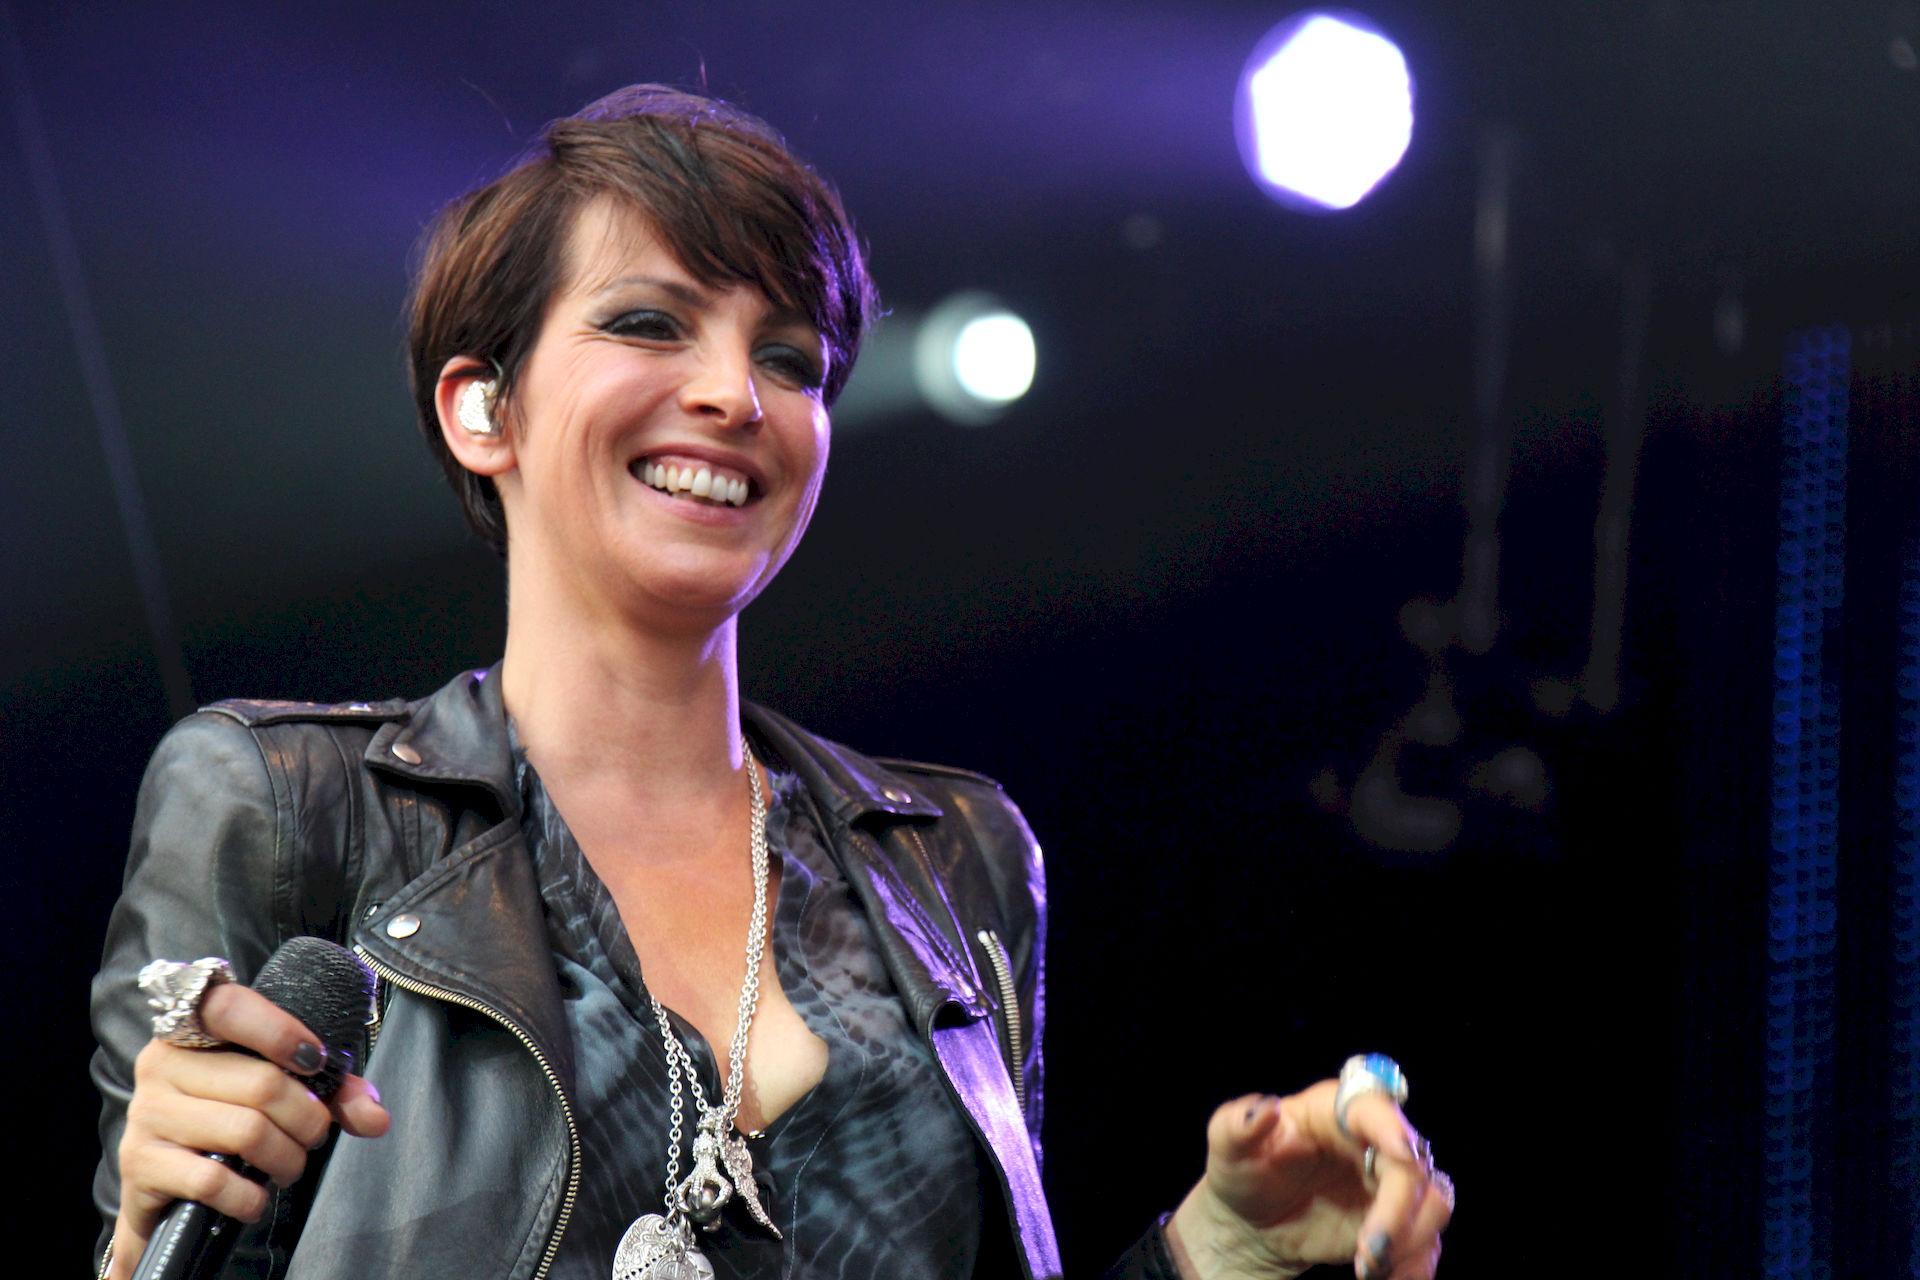 Photo of Nena: German singer and actress